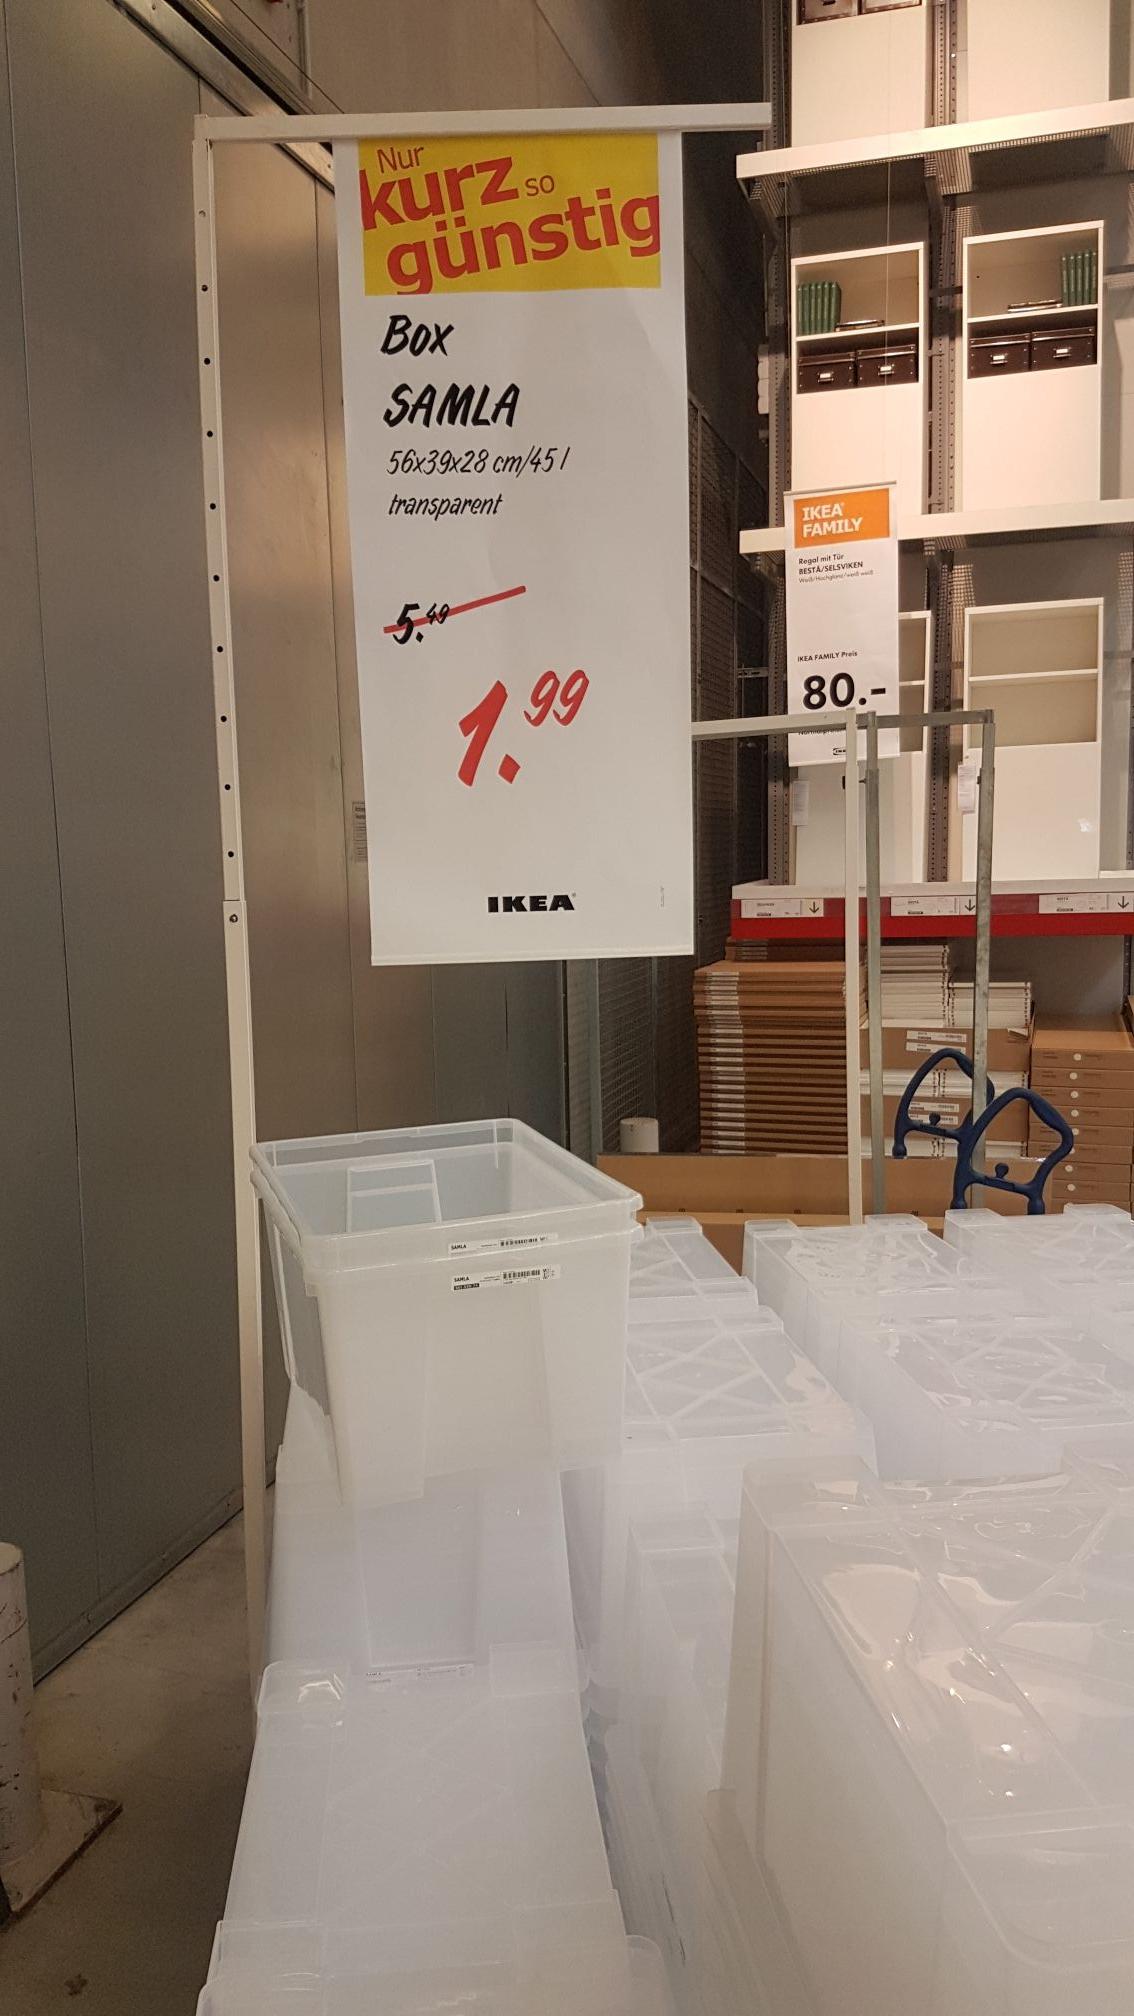 [LOKAL BERLIN] IKEA Box SAMLA 45L 56x39x28 *Lichtenberg*